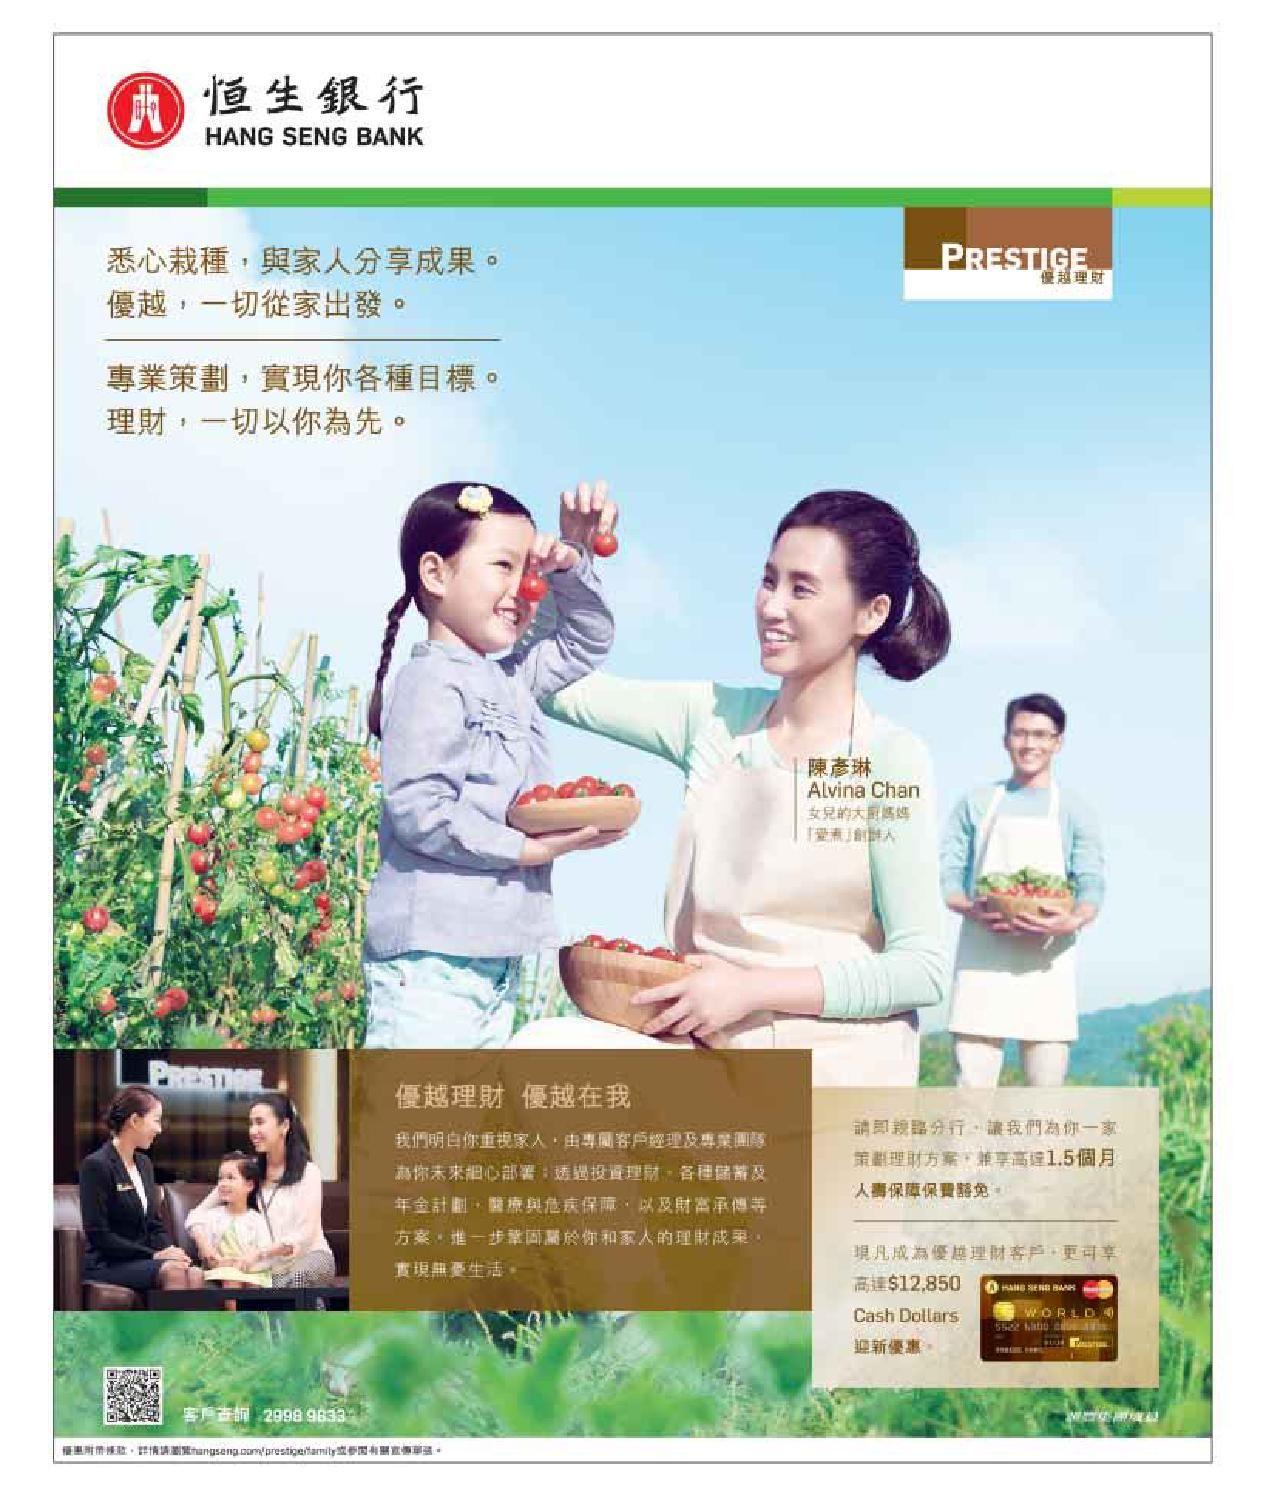 20150519 Cn Hong Kong Banks Ads Ads Insurance Ads